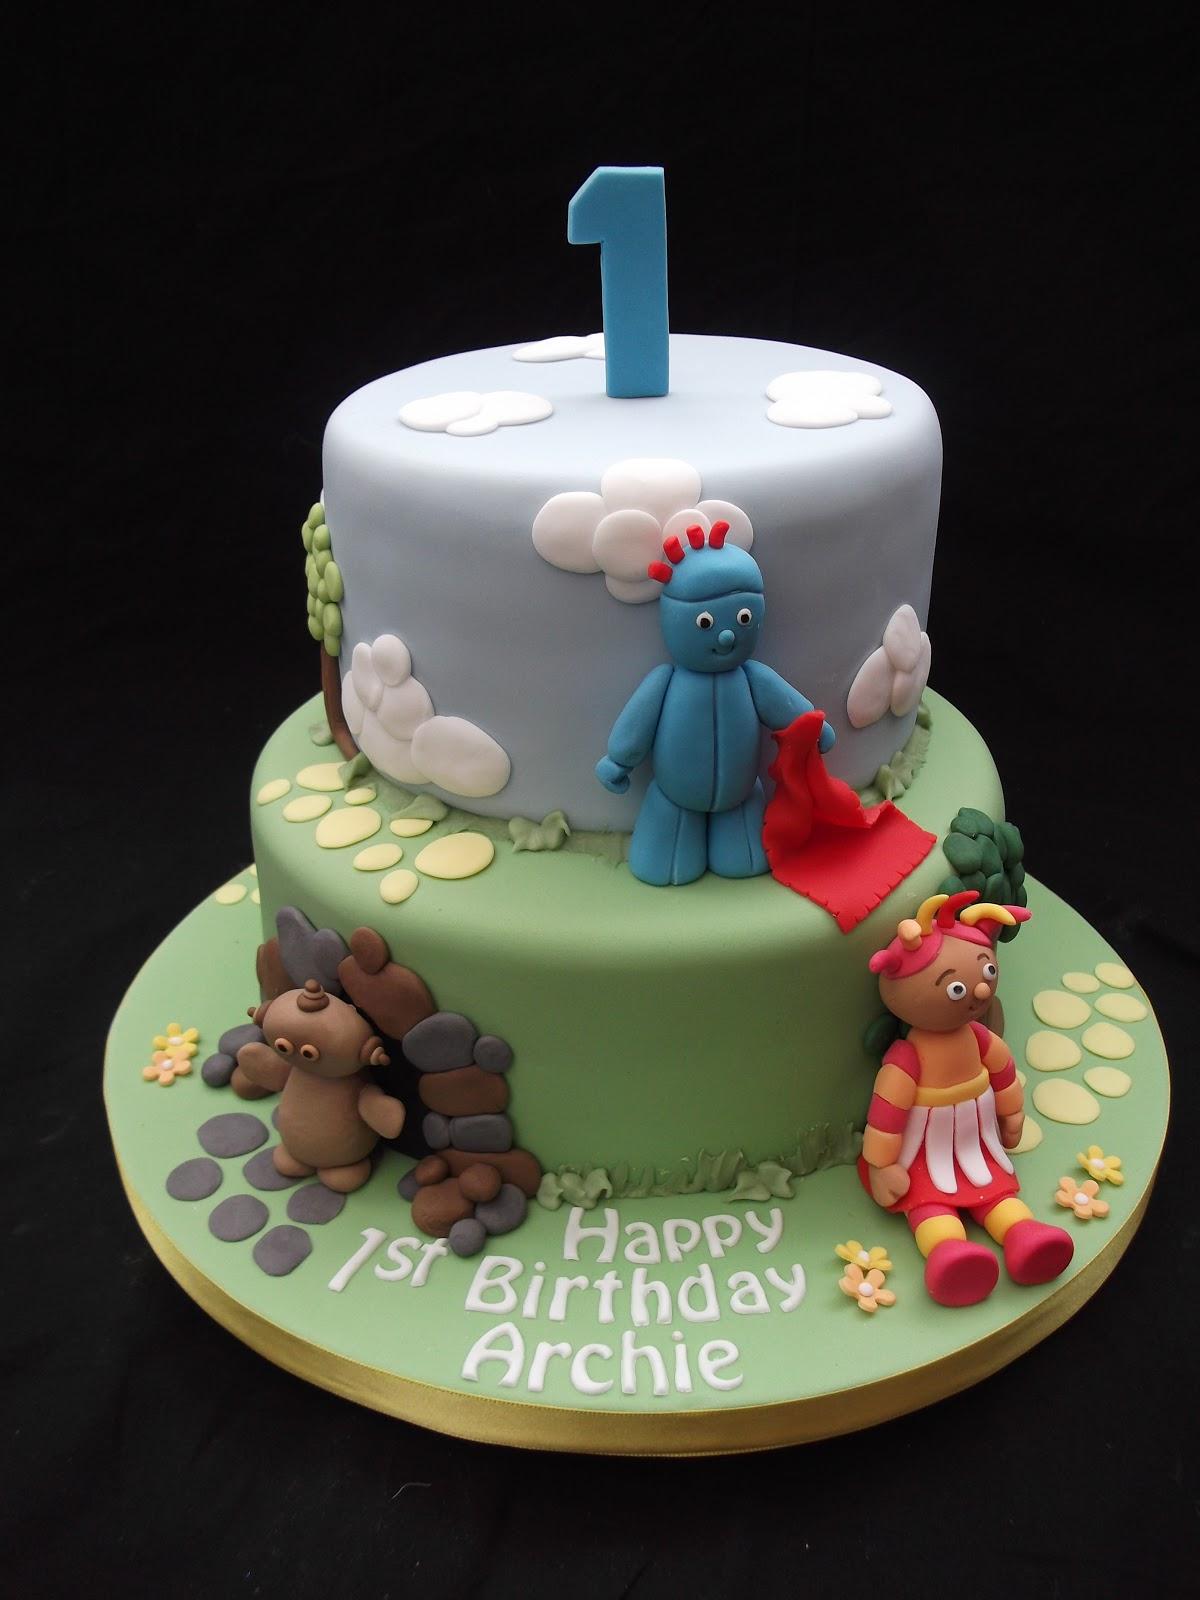 Cakes By Karen: In The Night Garden Cake